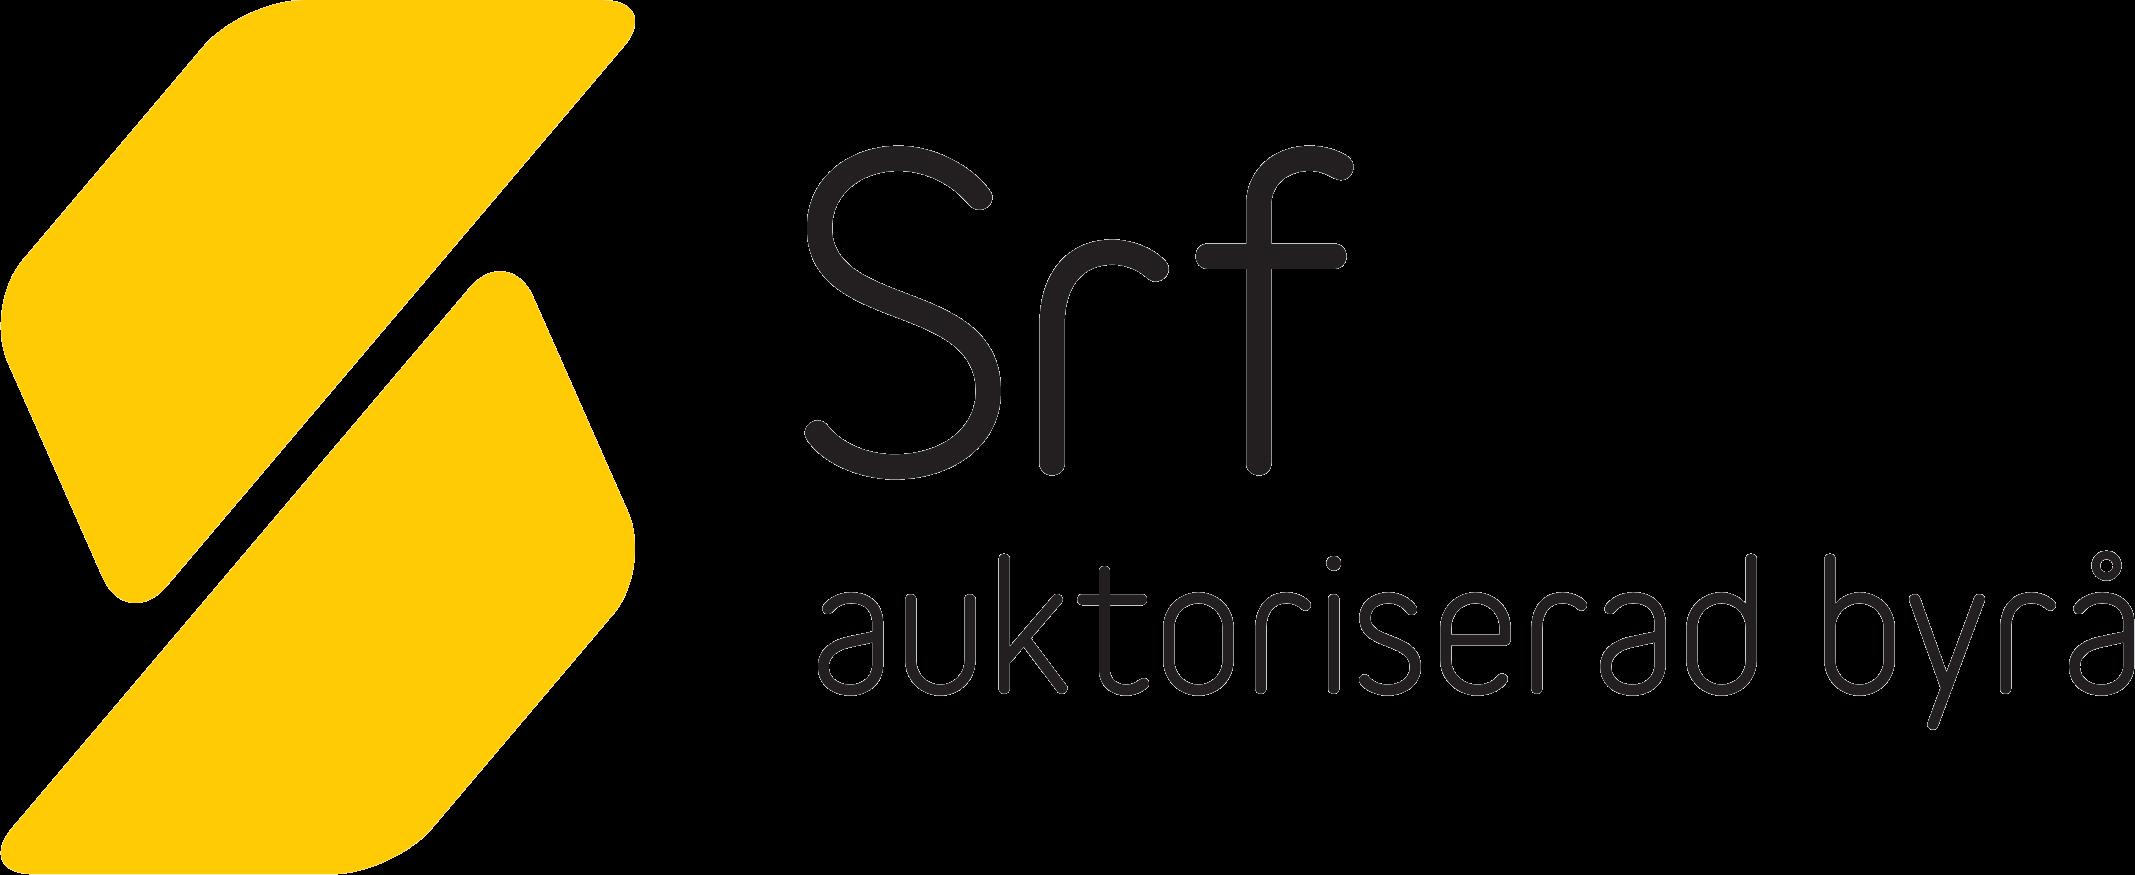 Srf-auktoriserad-byra_tvarad.png